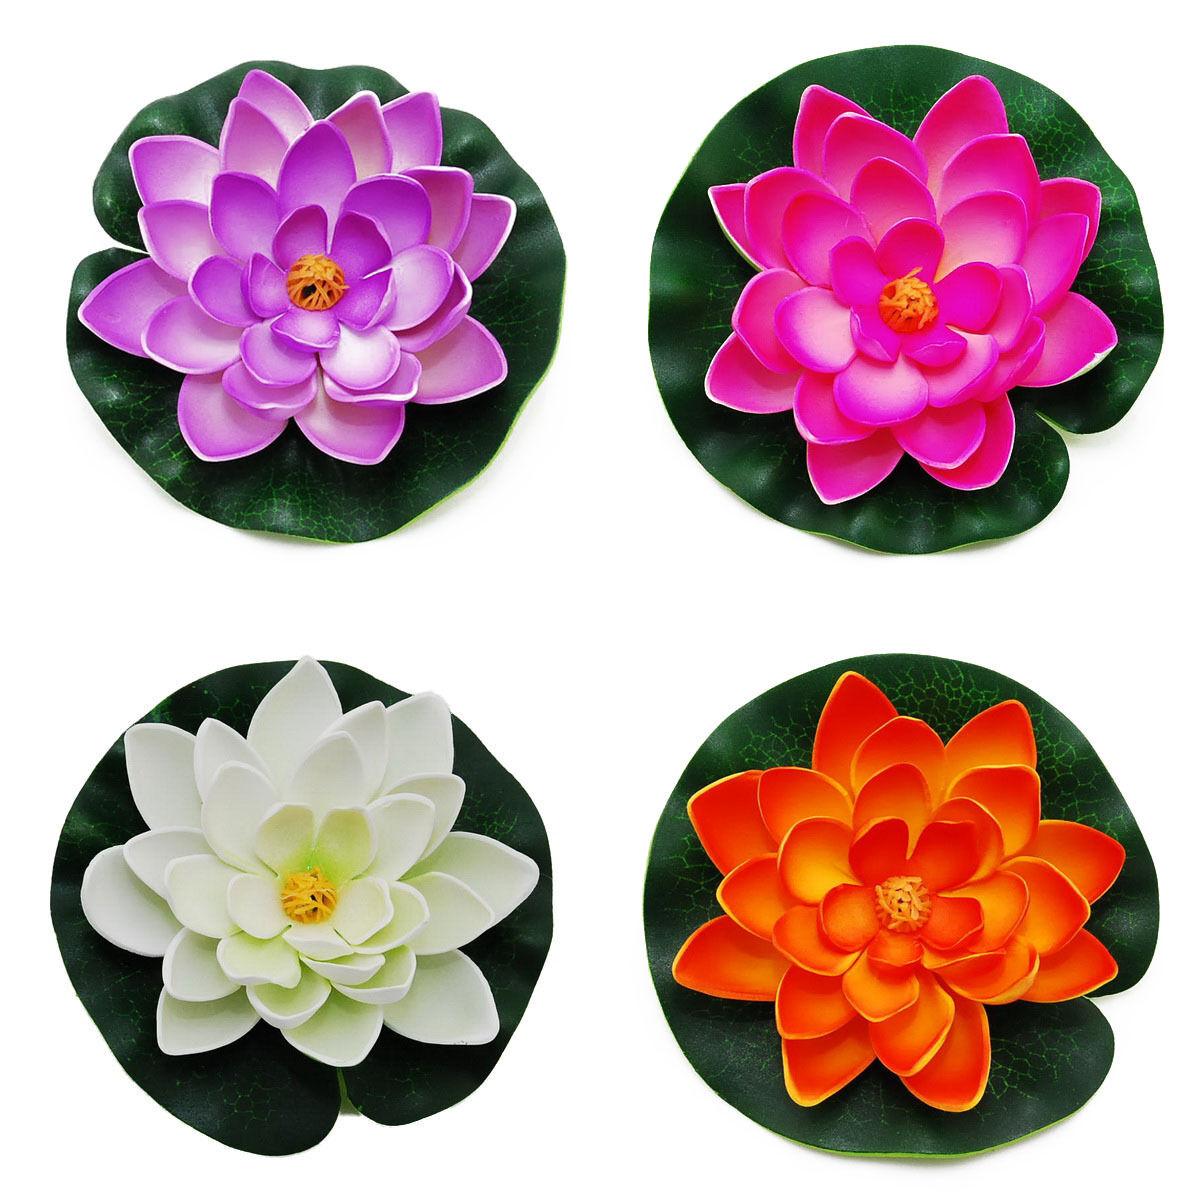 Water Lily Lotus Foam Flower Cnz Medium Floating Pond Decor Set Of 4